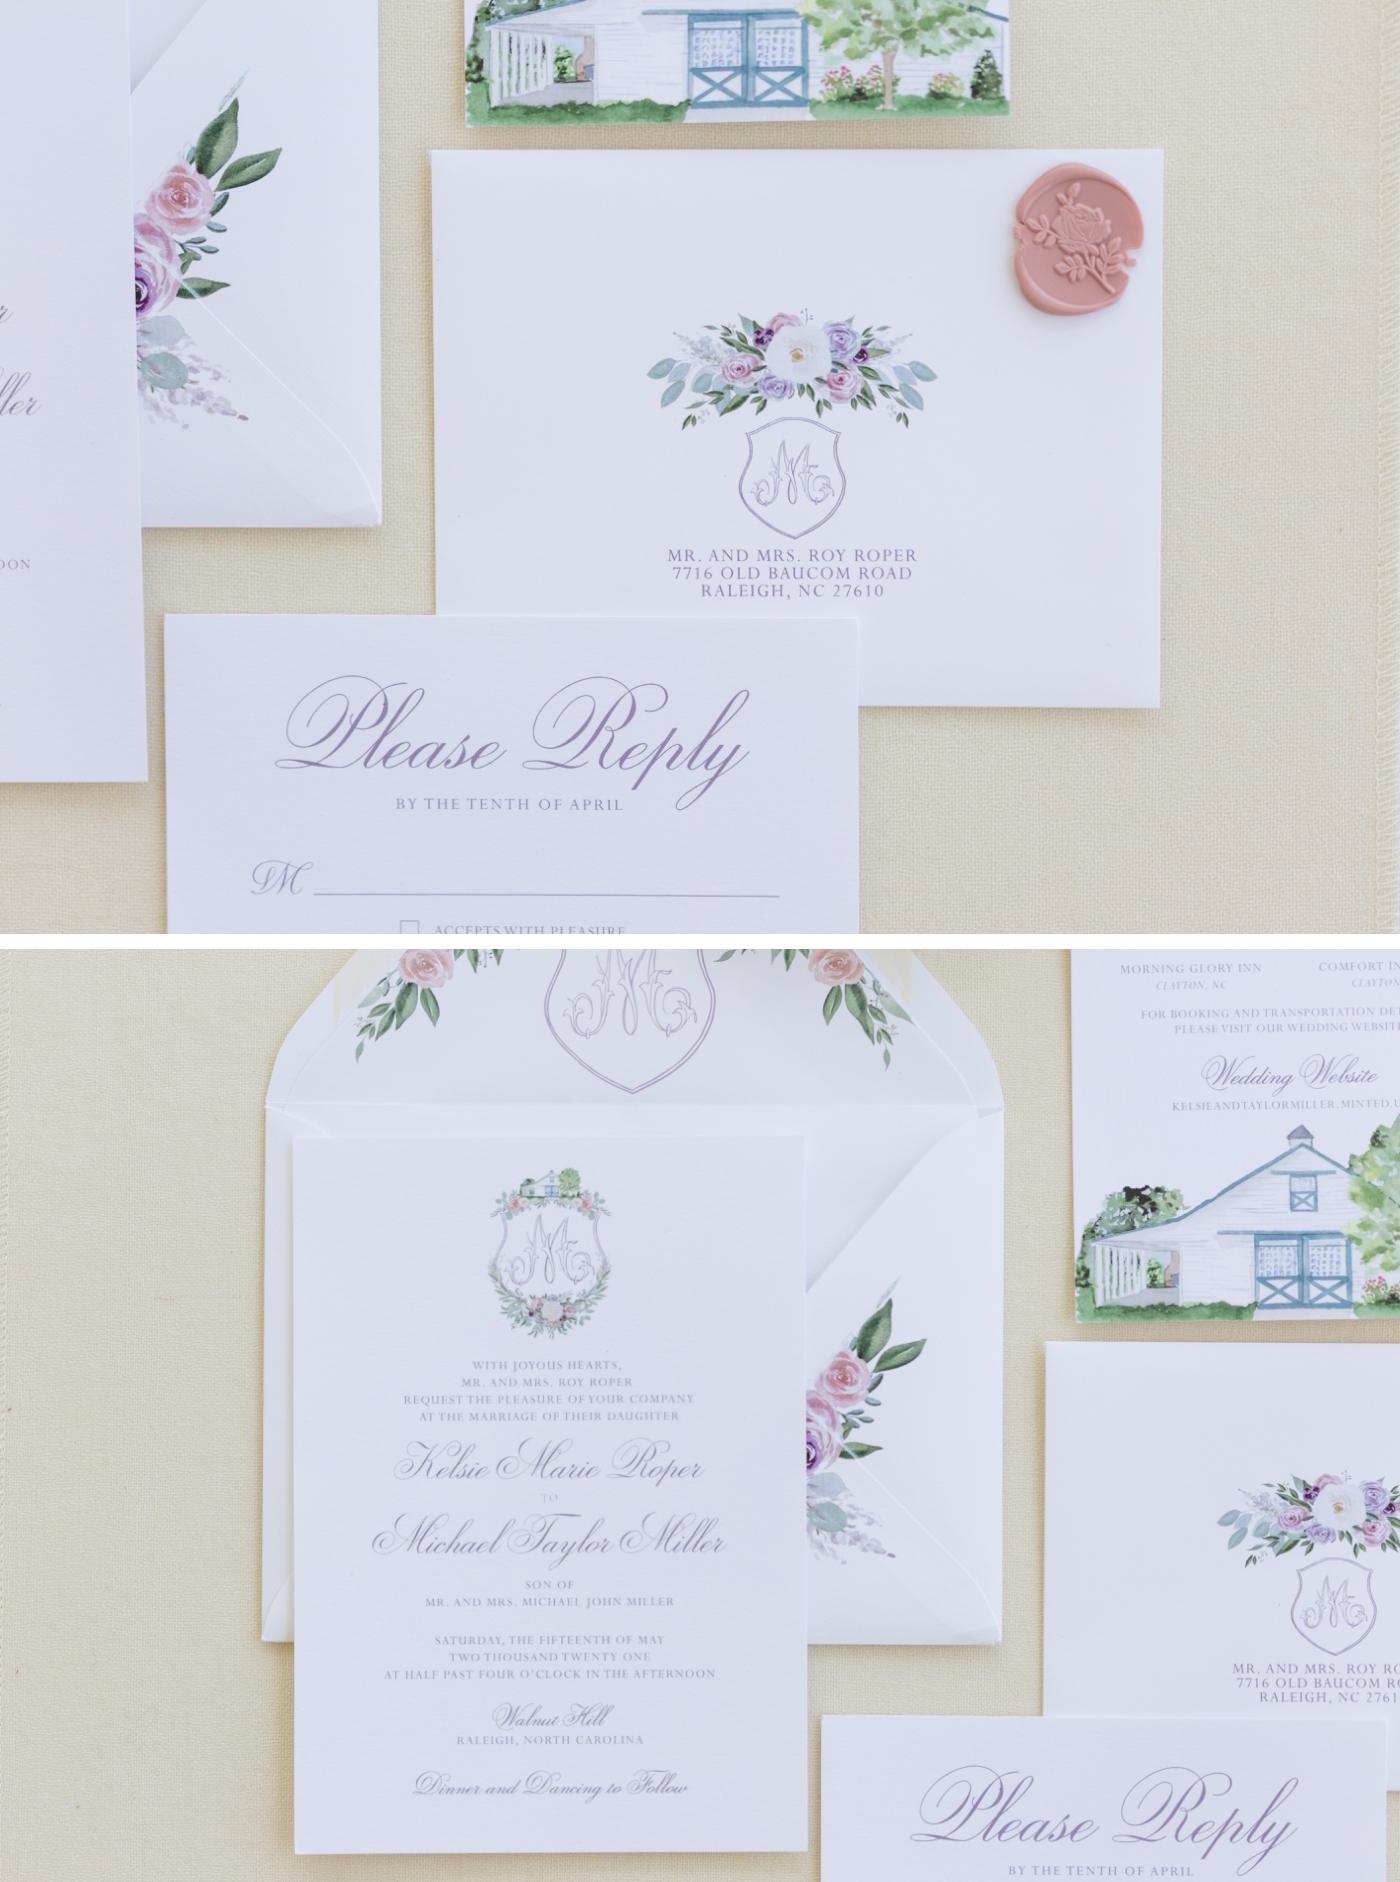 Hand-painted floral wedding invitation envelopes